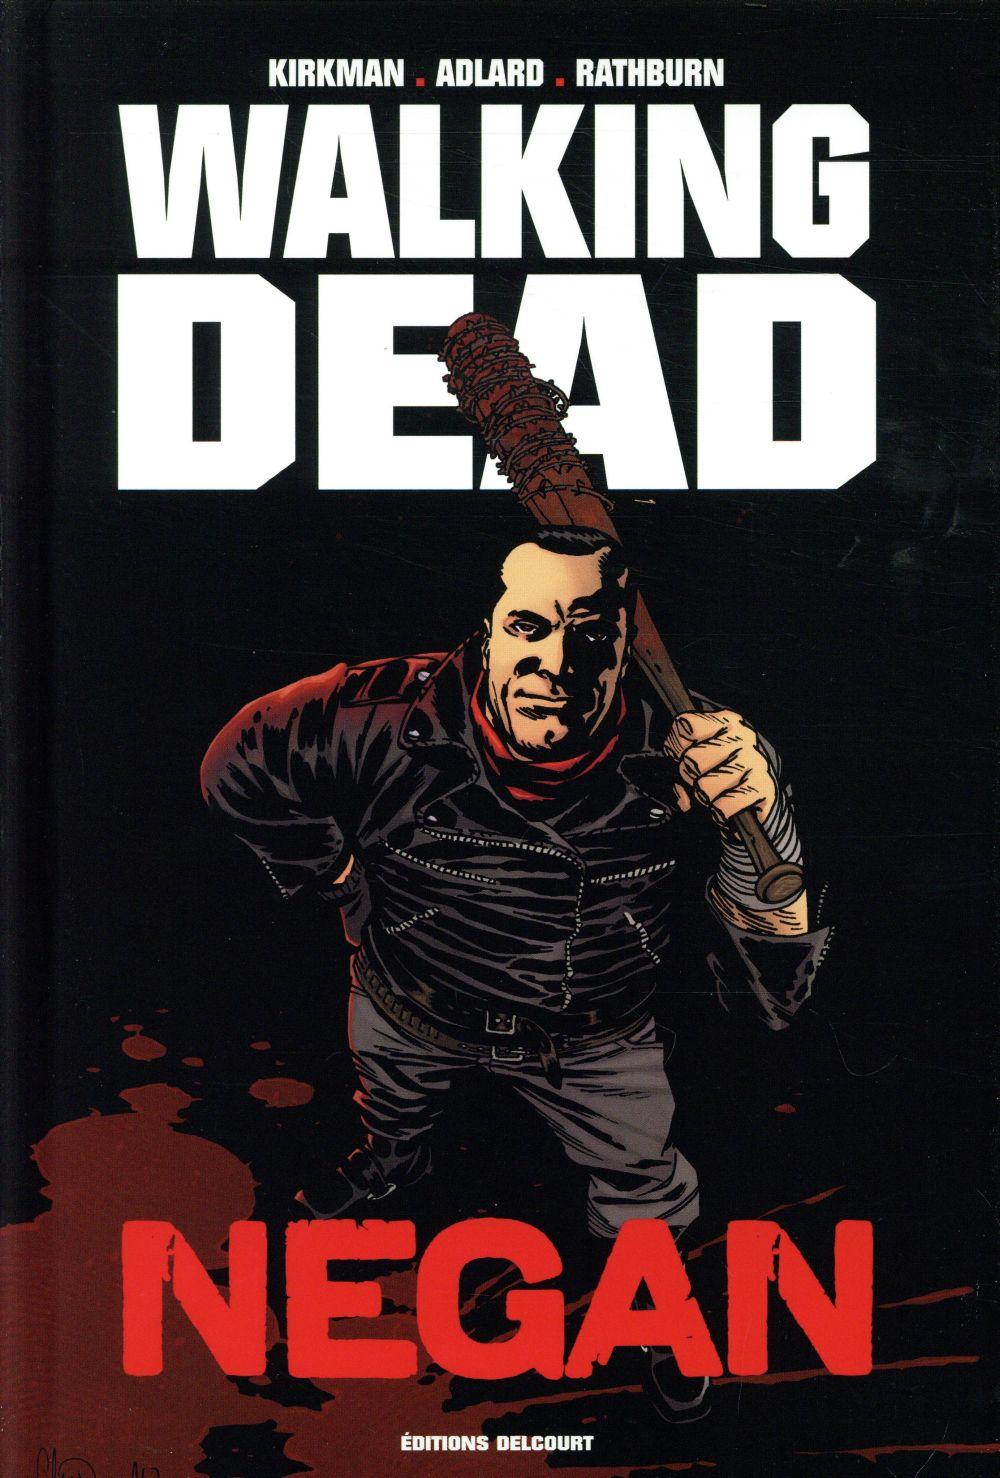 Walking dead HORS-SERIE ; negan